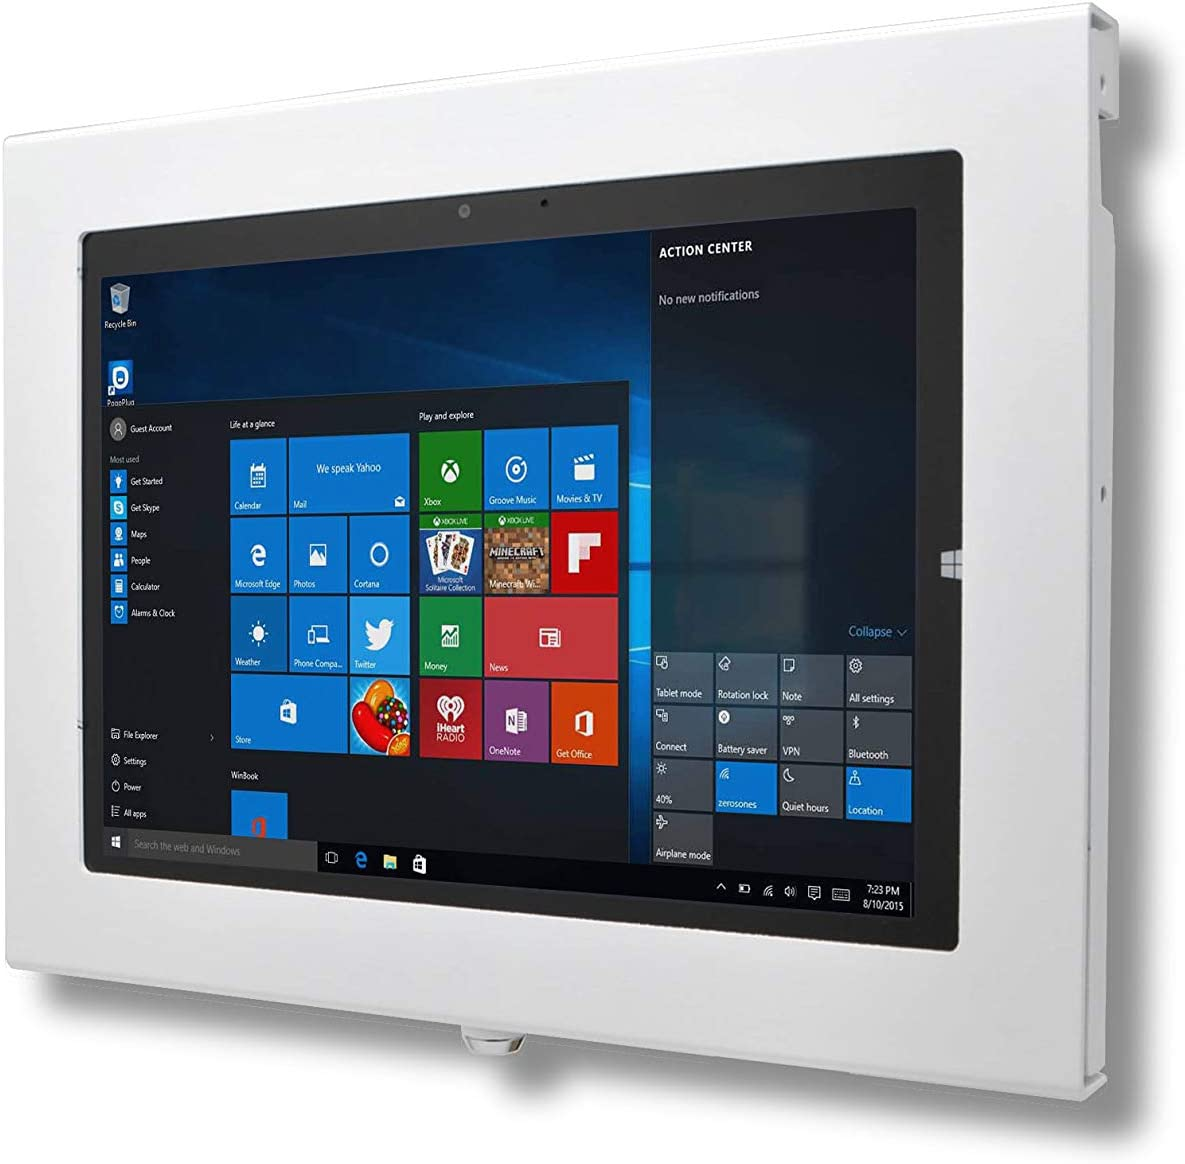 "TABcare Locking Anti-Theft Metal Case for Dell Latitude Venue 8"" 10"" 12"" Tablet for Kiosk, POS, Store, Show Display, Time Clock (Latitude 7275, White)"